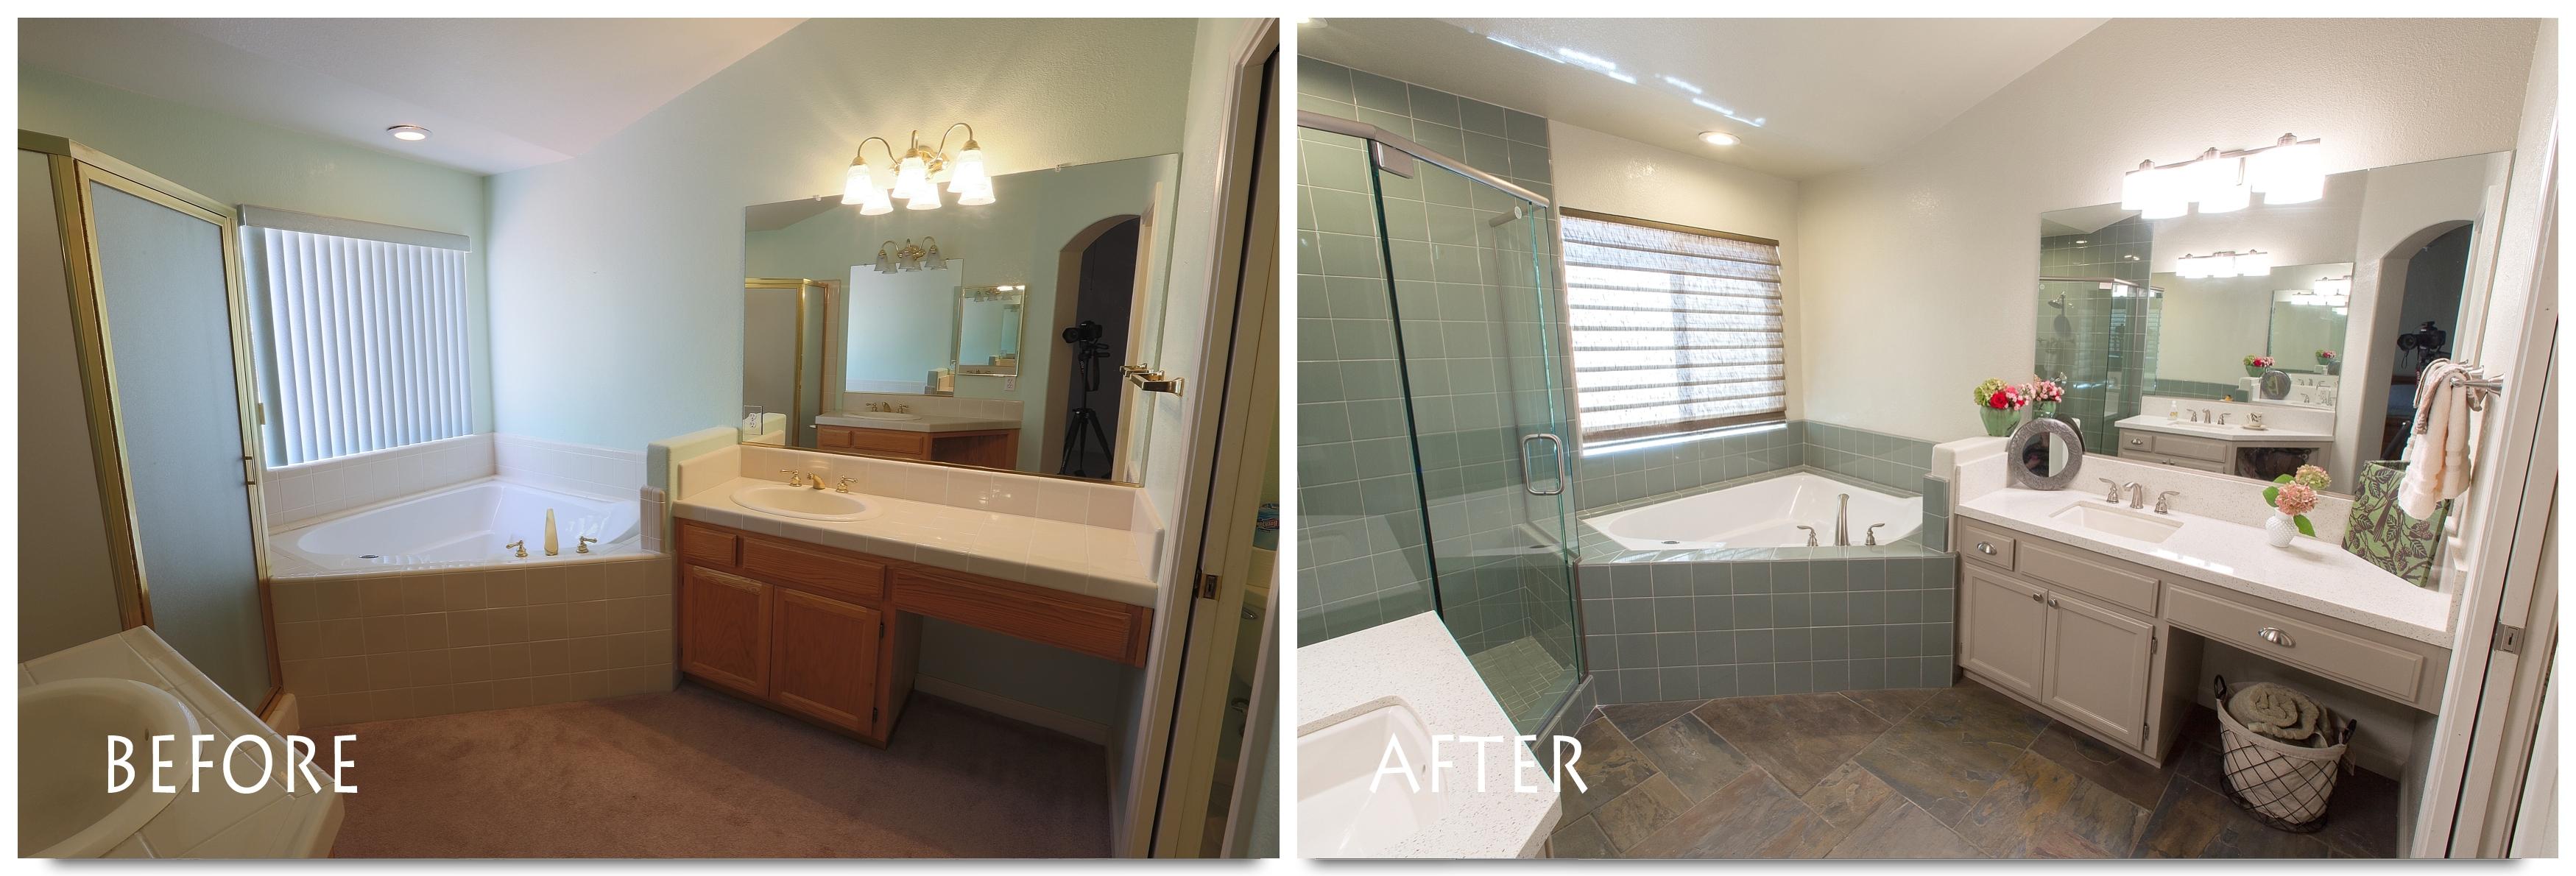 dark to light bathroom remodeling ideas | lovelyspaces.com